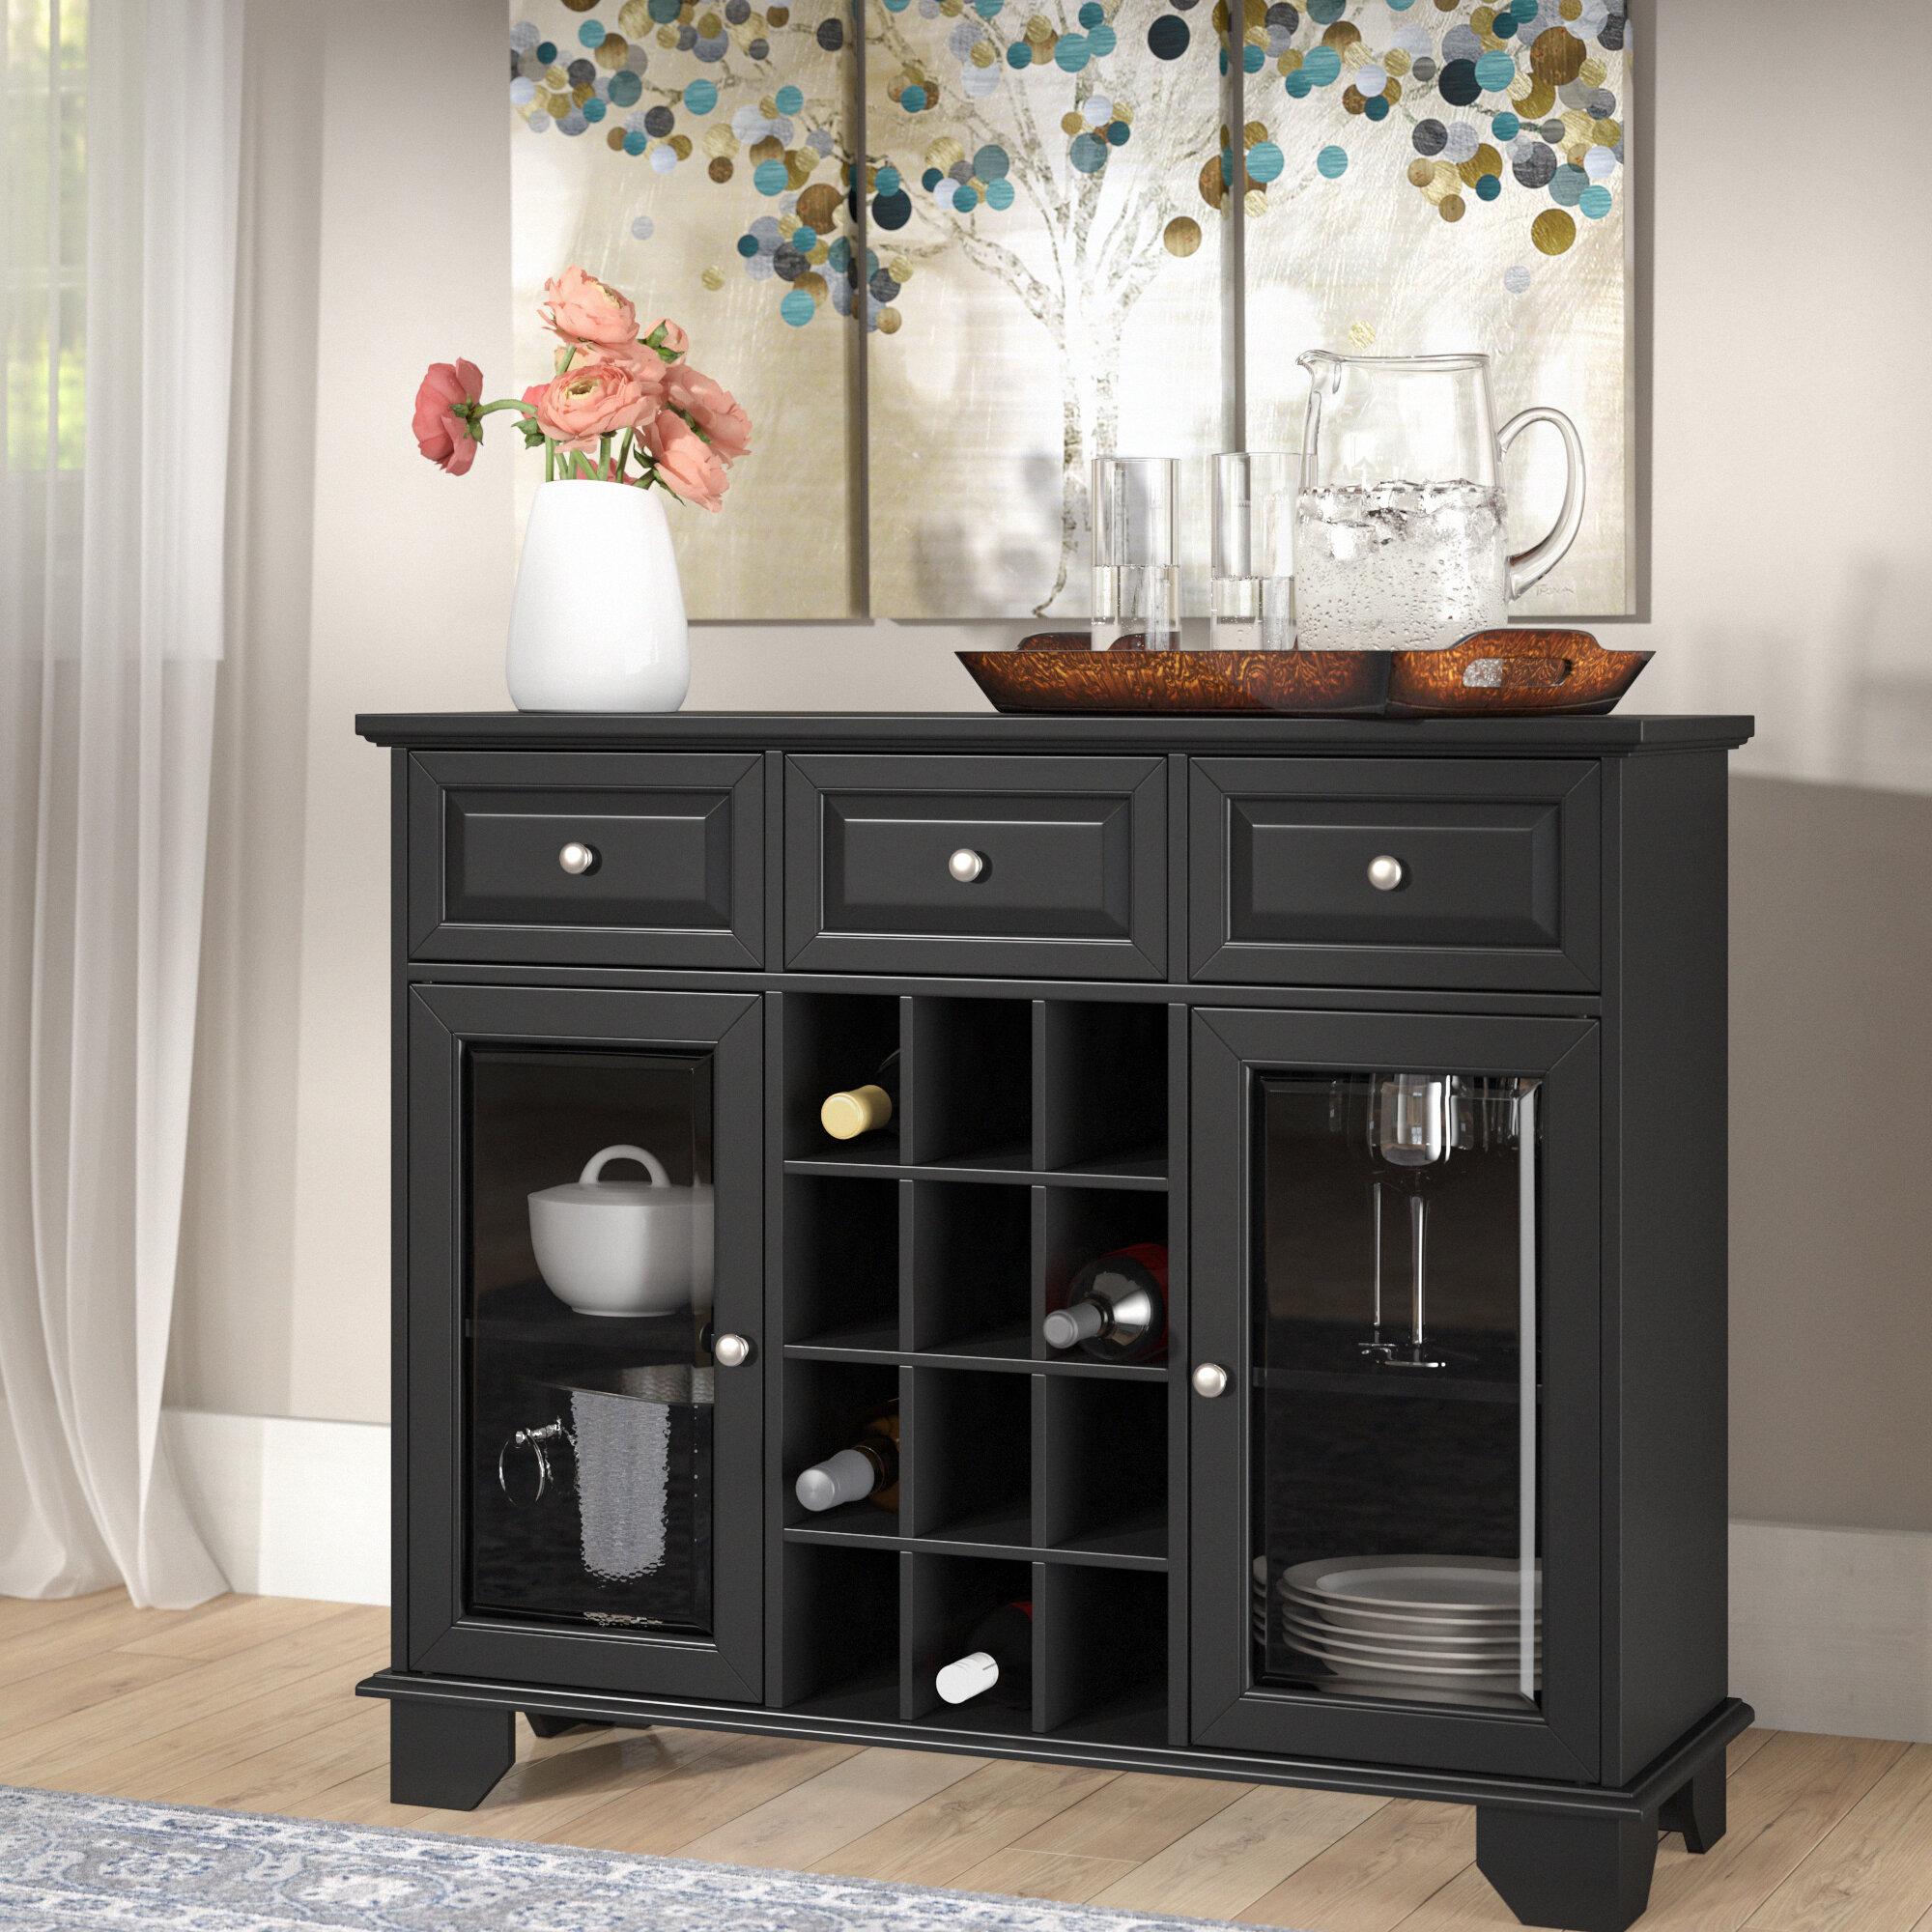 Ross Wood Server With 12 Bottle Floor Wine Cabinet